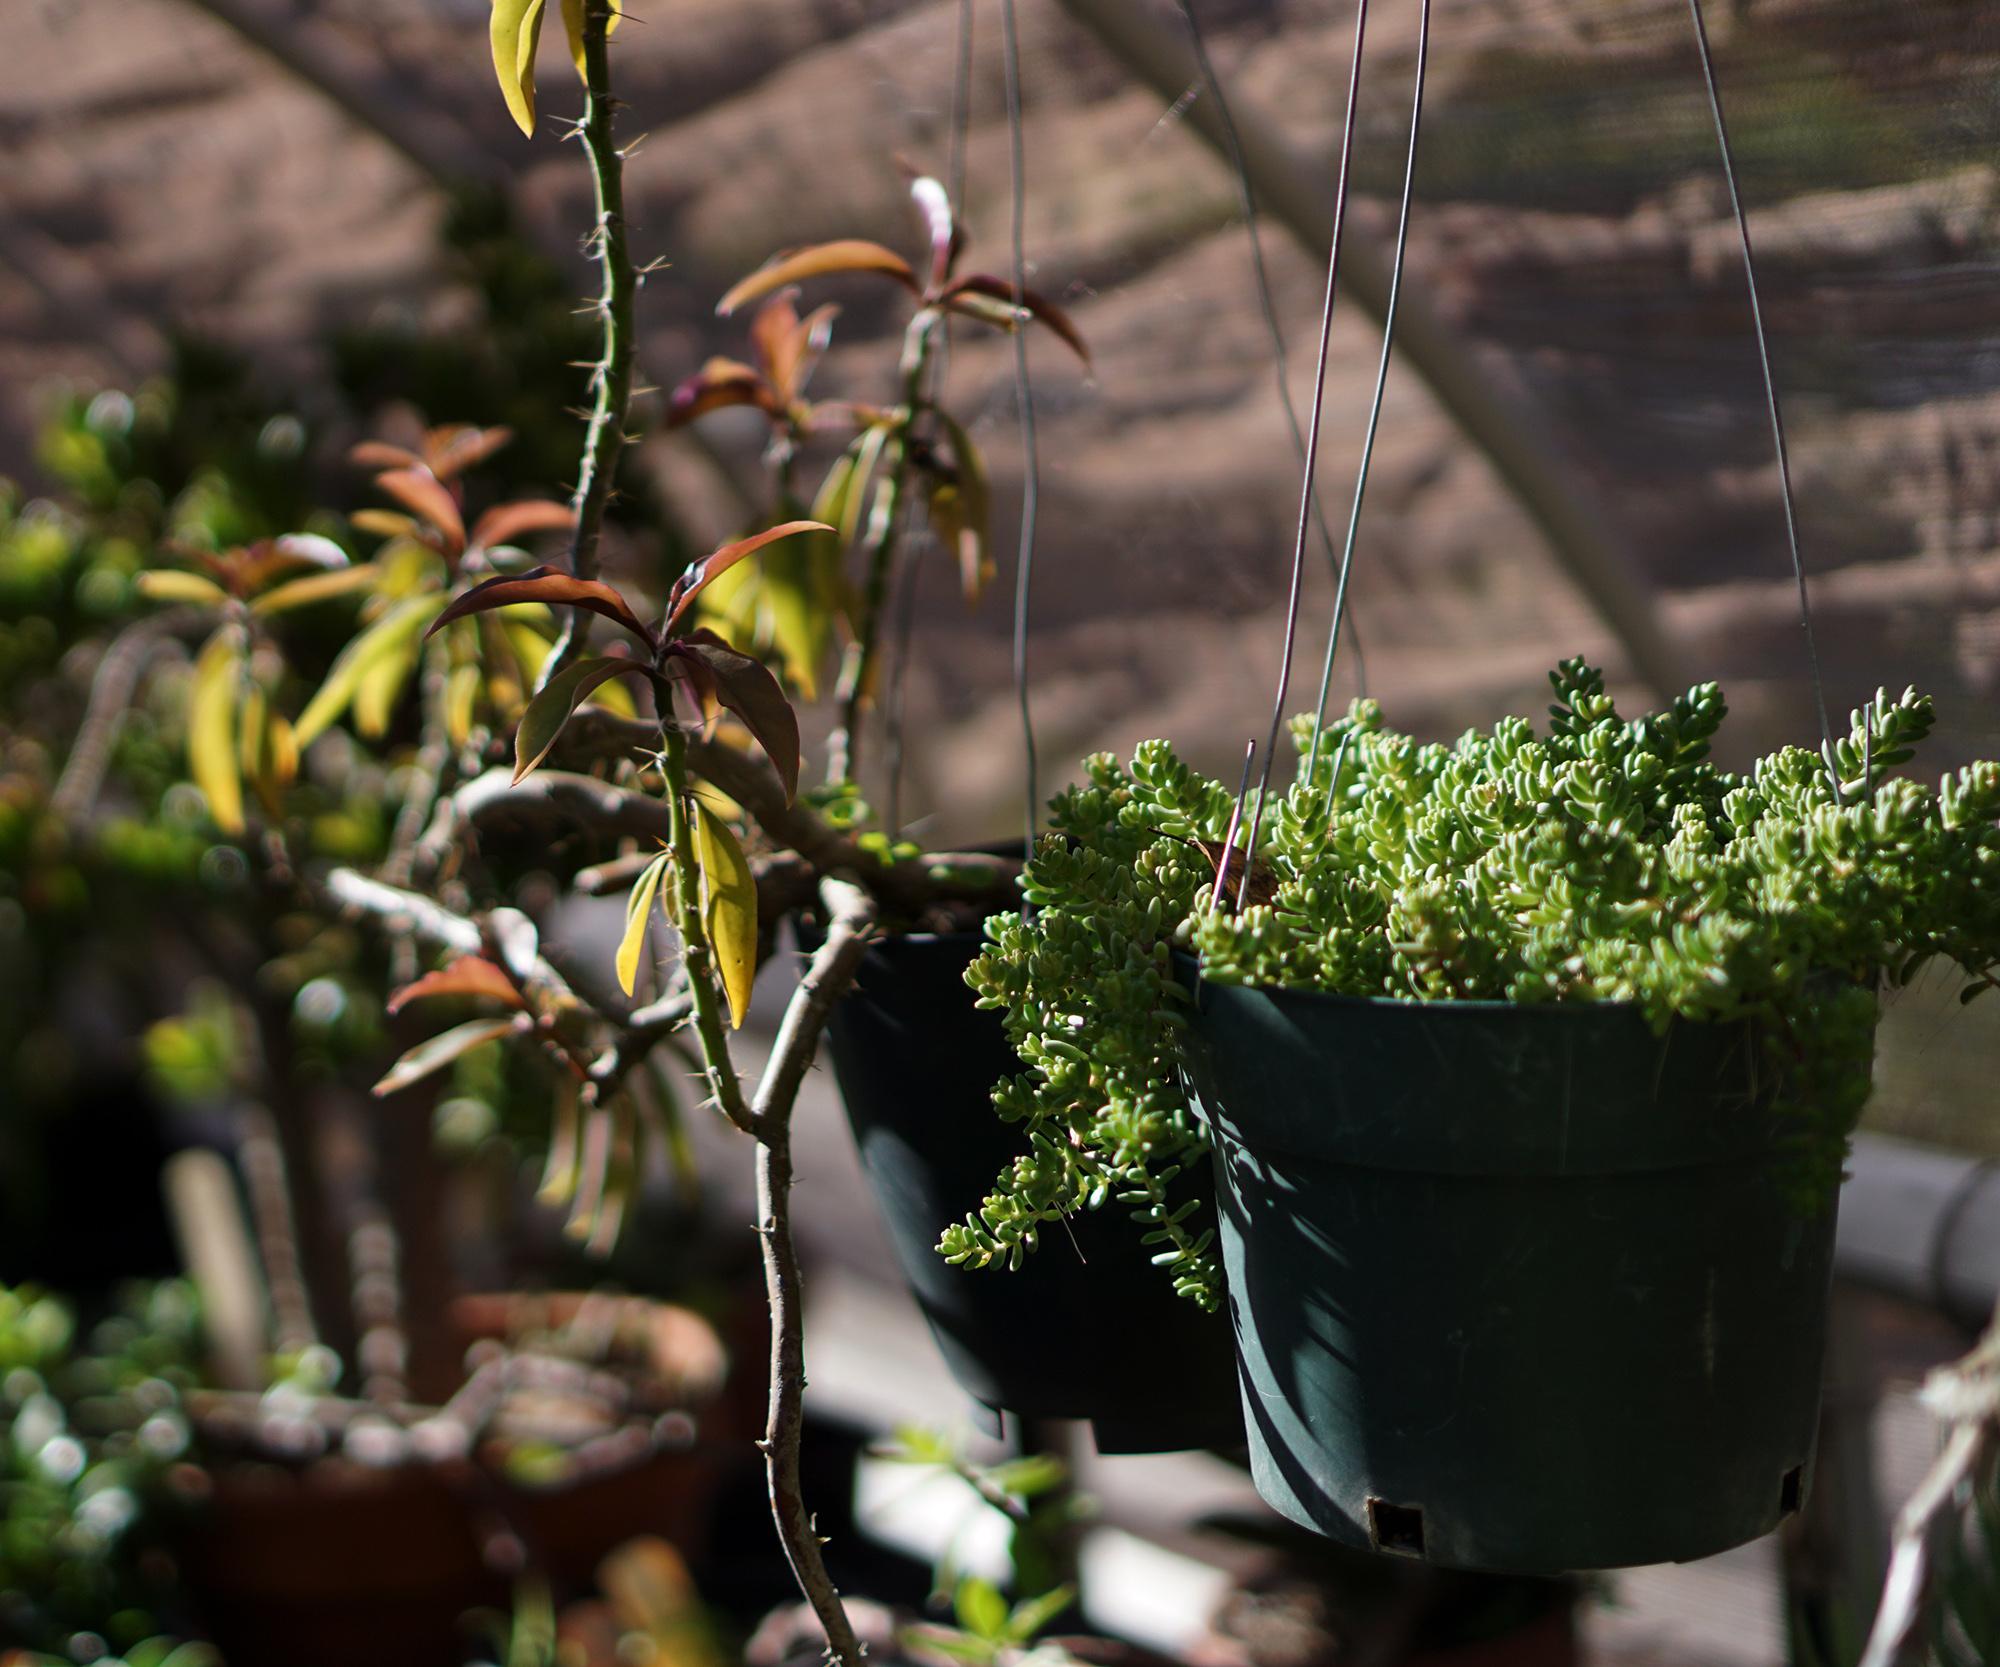 Succulents in a hoop house, San Francisco Botanical Garden / Darker than Green